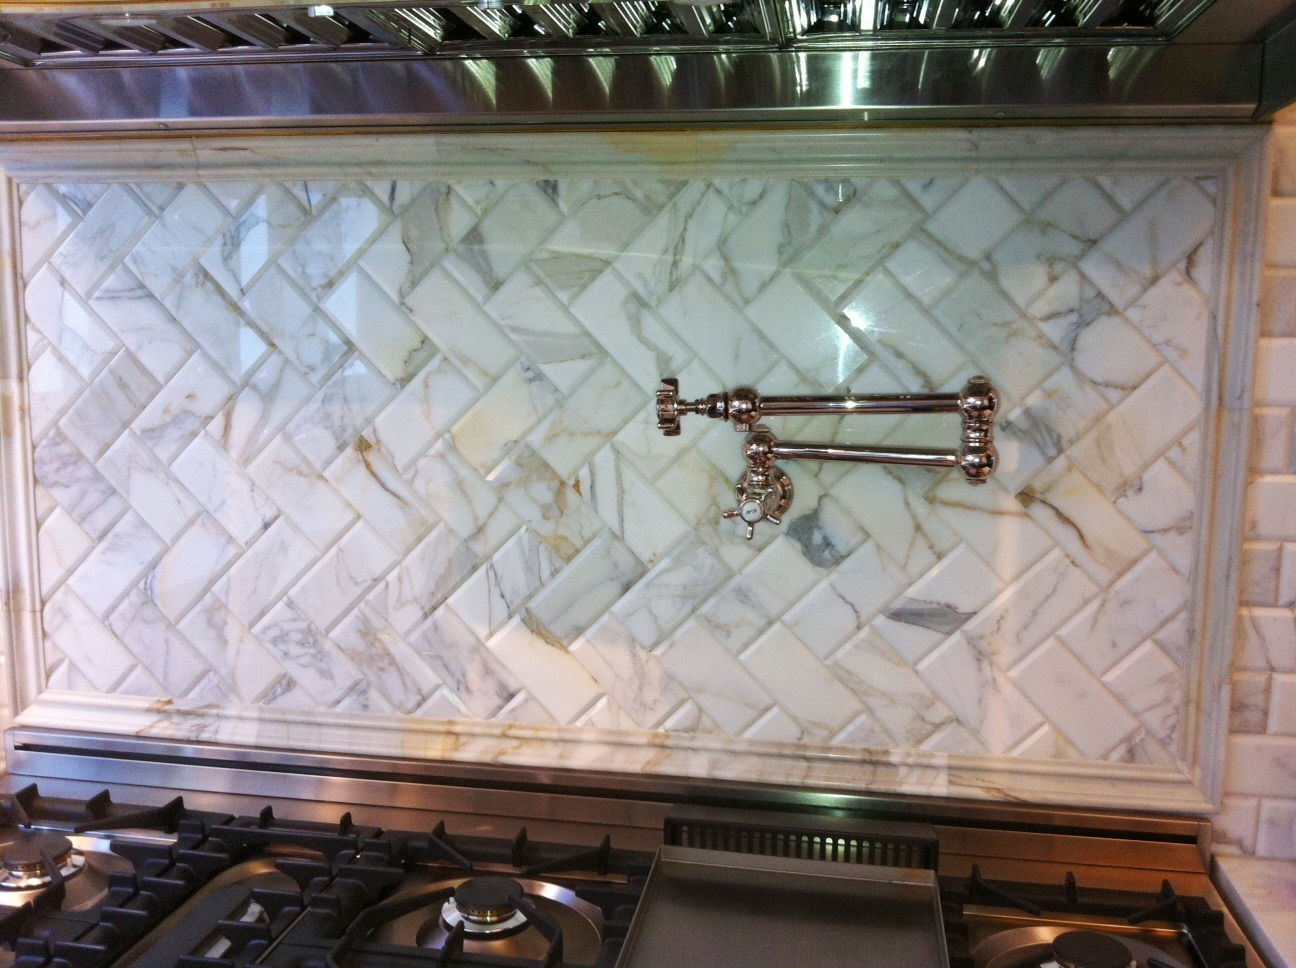 Kitchen Backsplash Design Examples